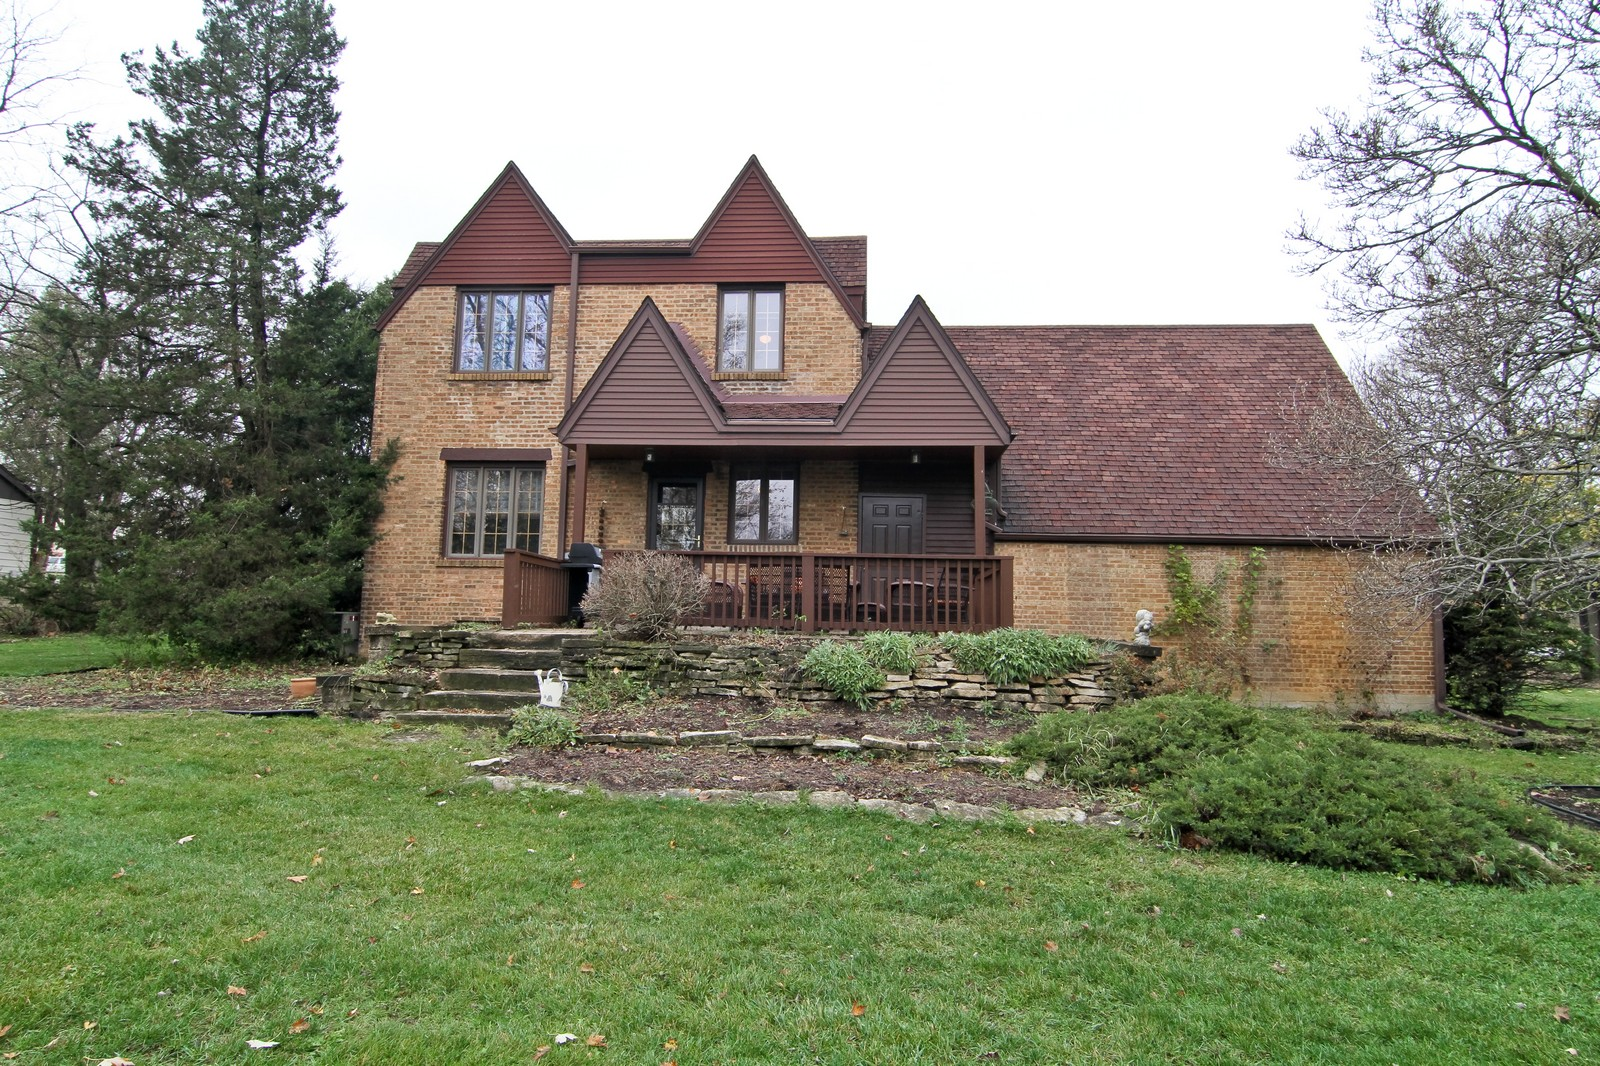 Real Estate Photography - 933 N Main, Glen Ellyn, IL, 60137 - Rear View